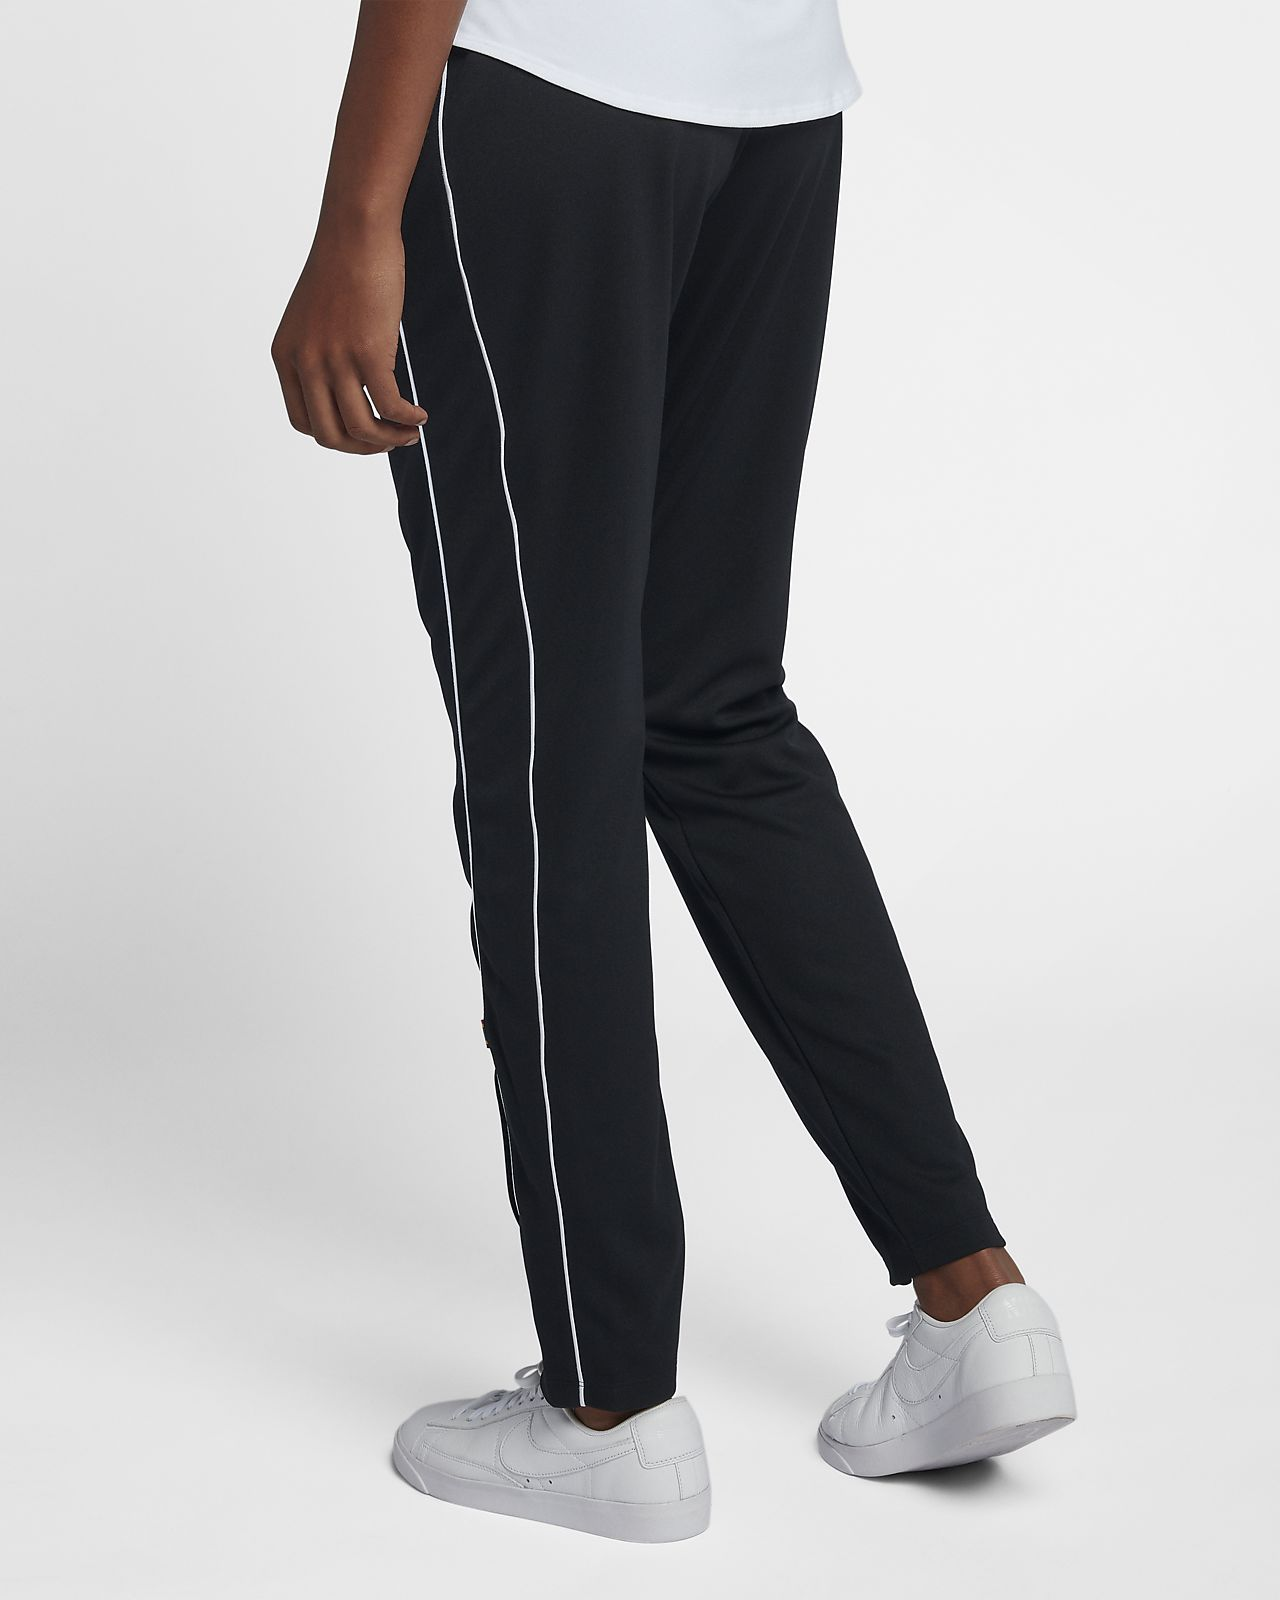 pantaloni nike tennis